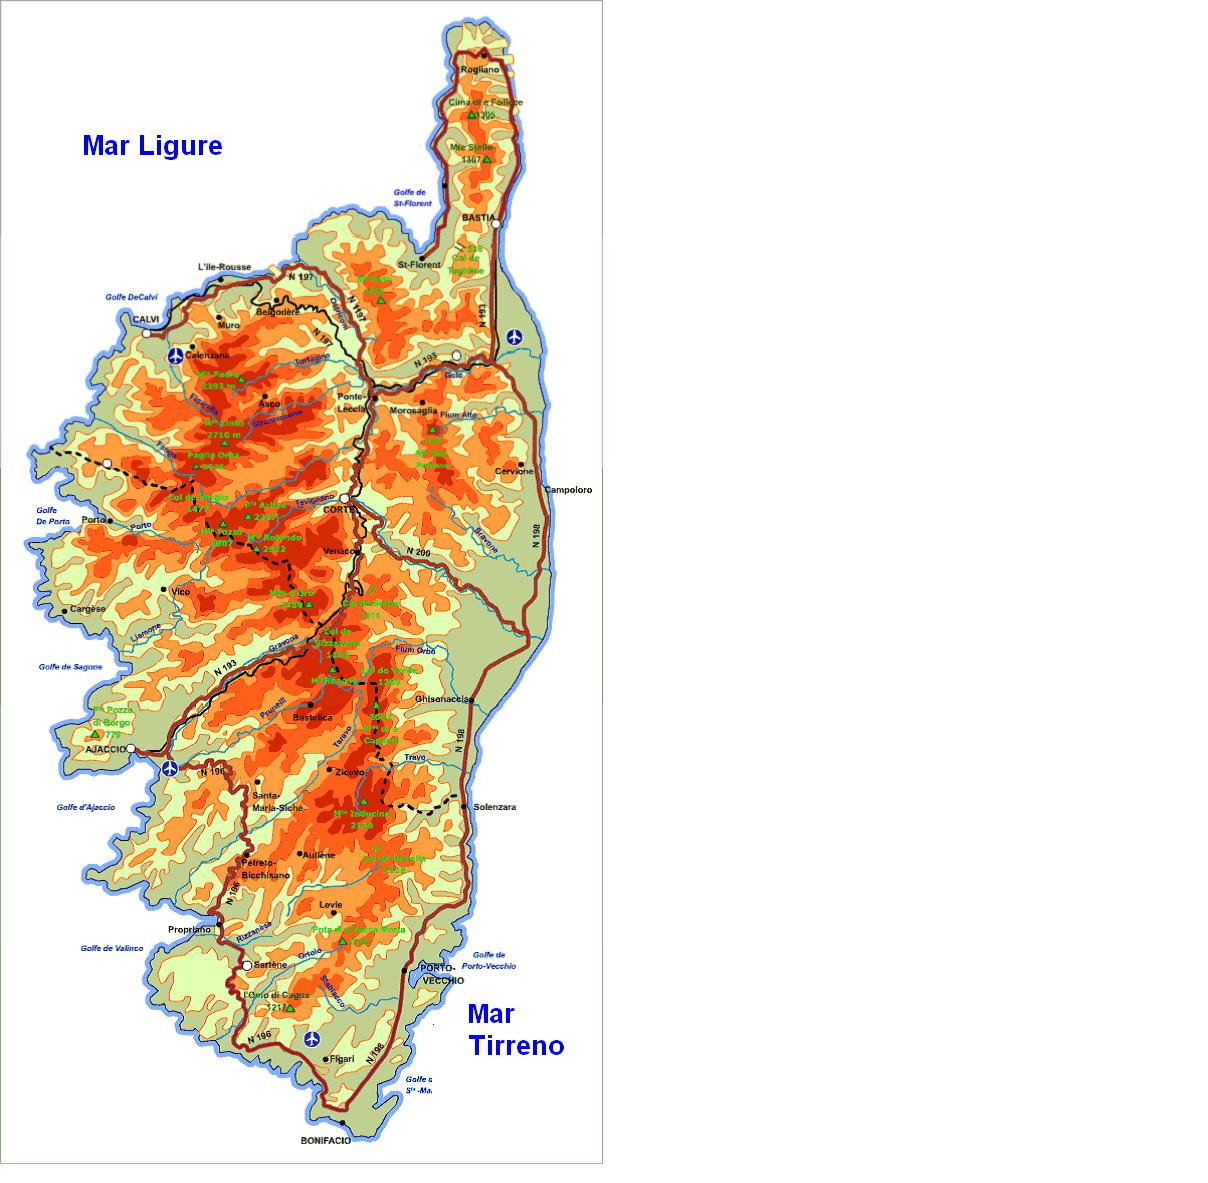 Image:Corsica